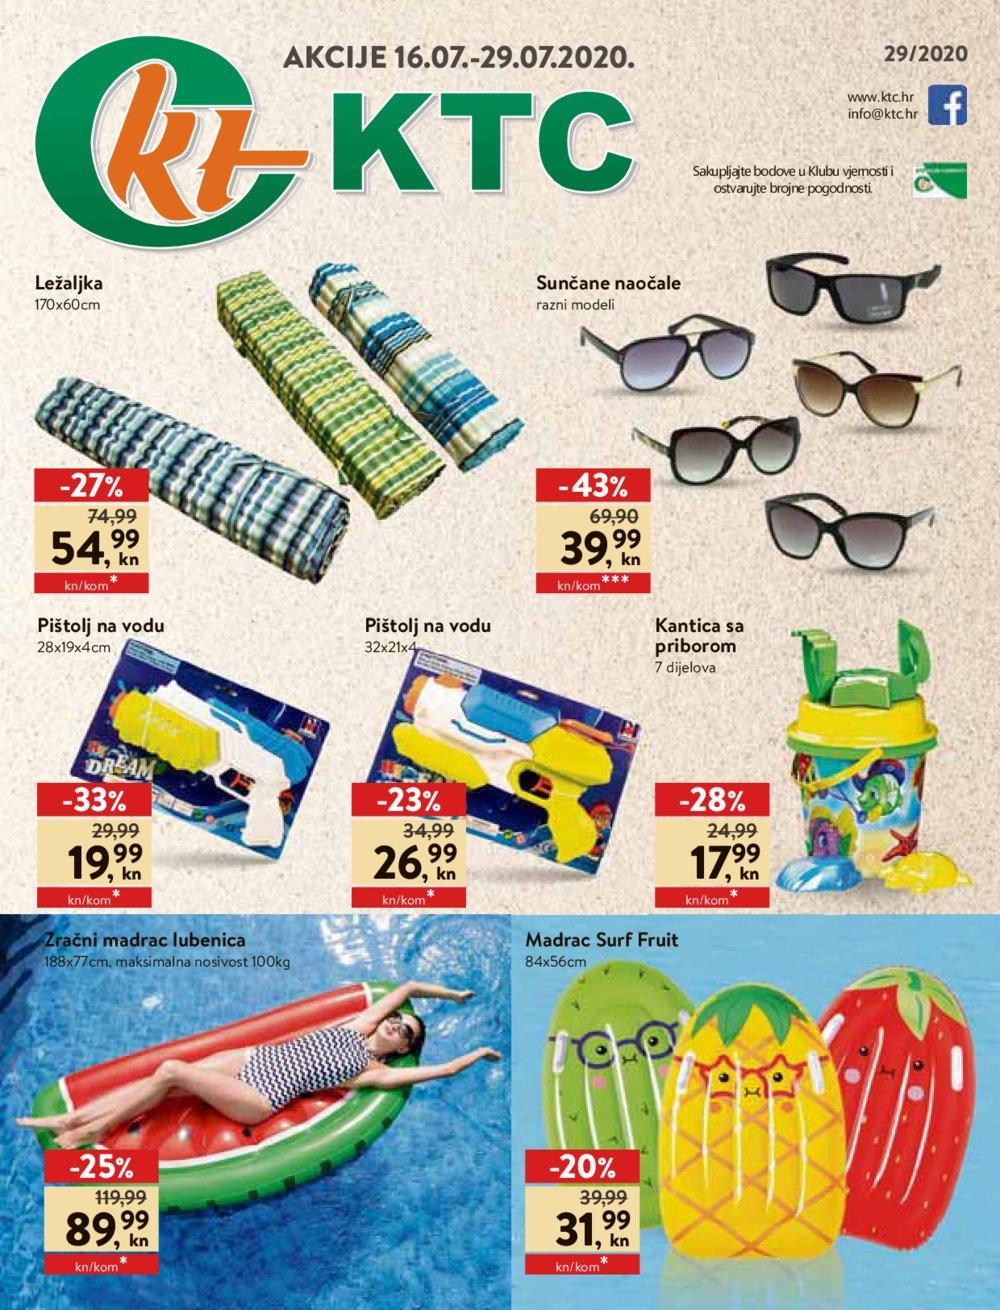 KTC katalog Igračke i tekstil 16.07.-29.07.2020.